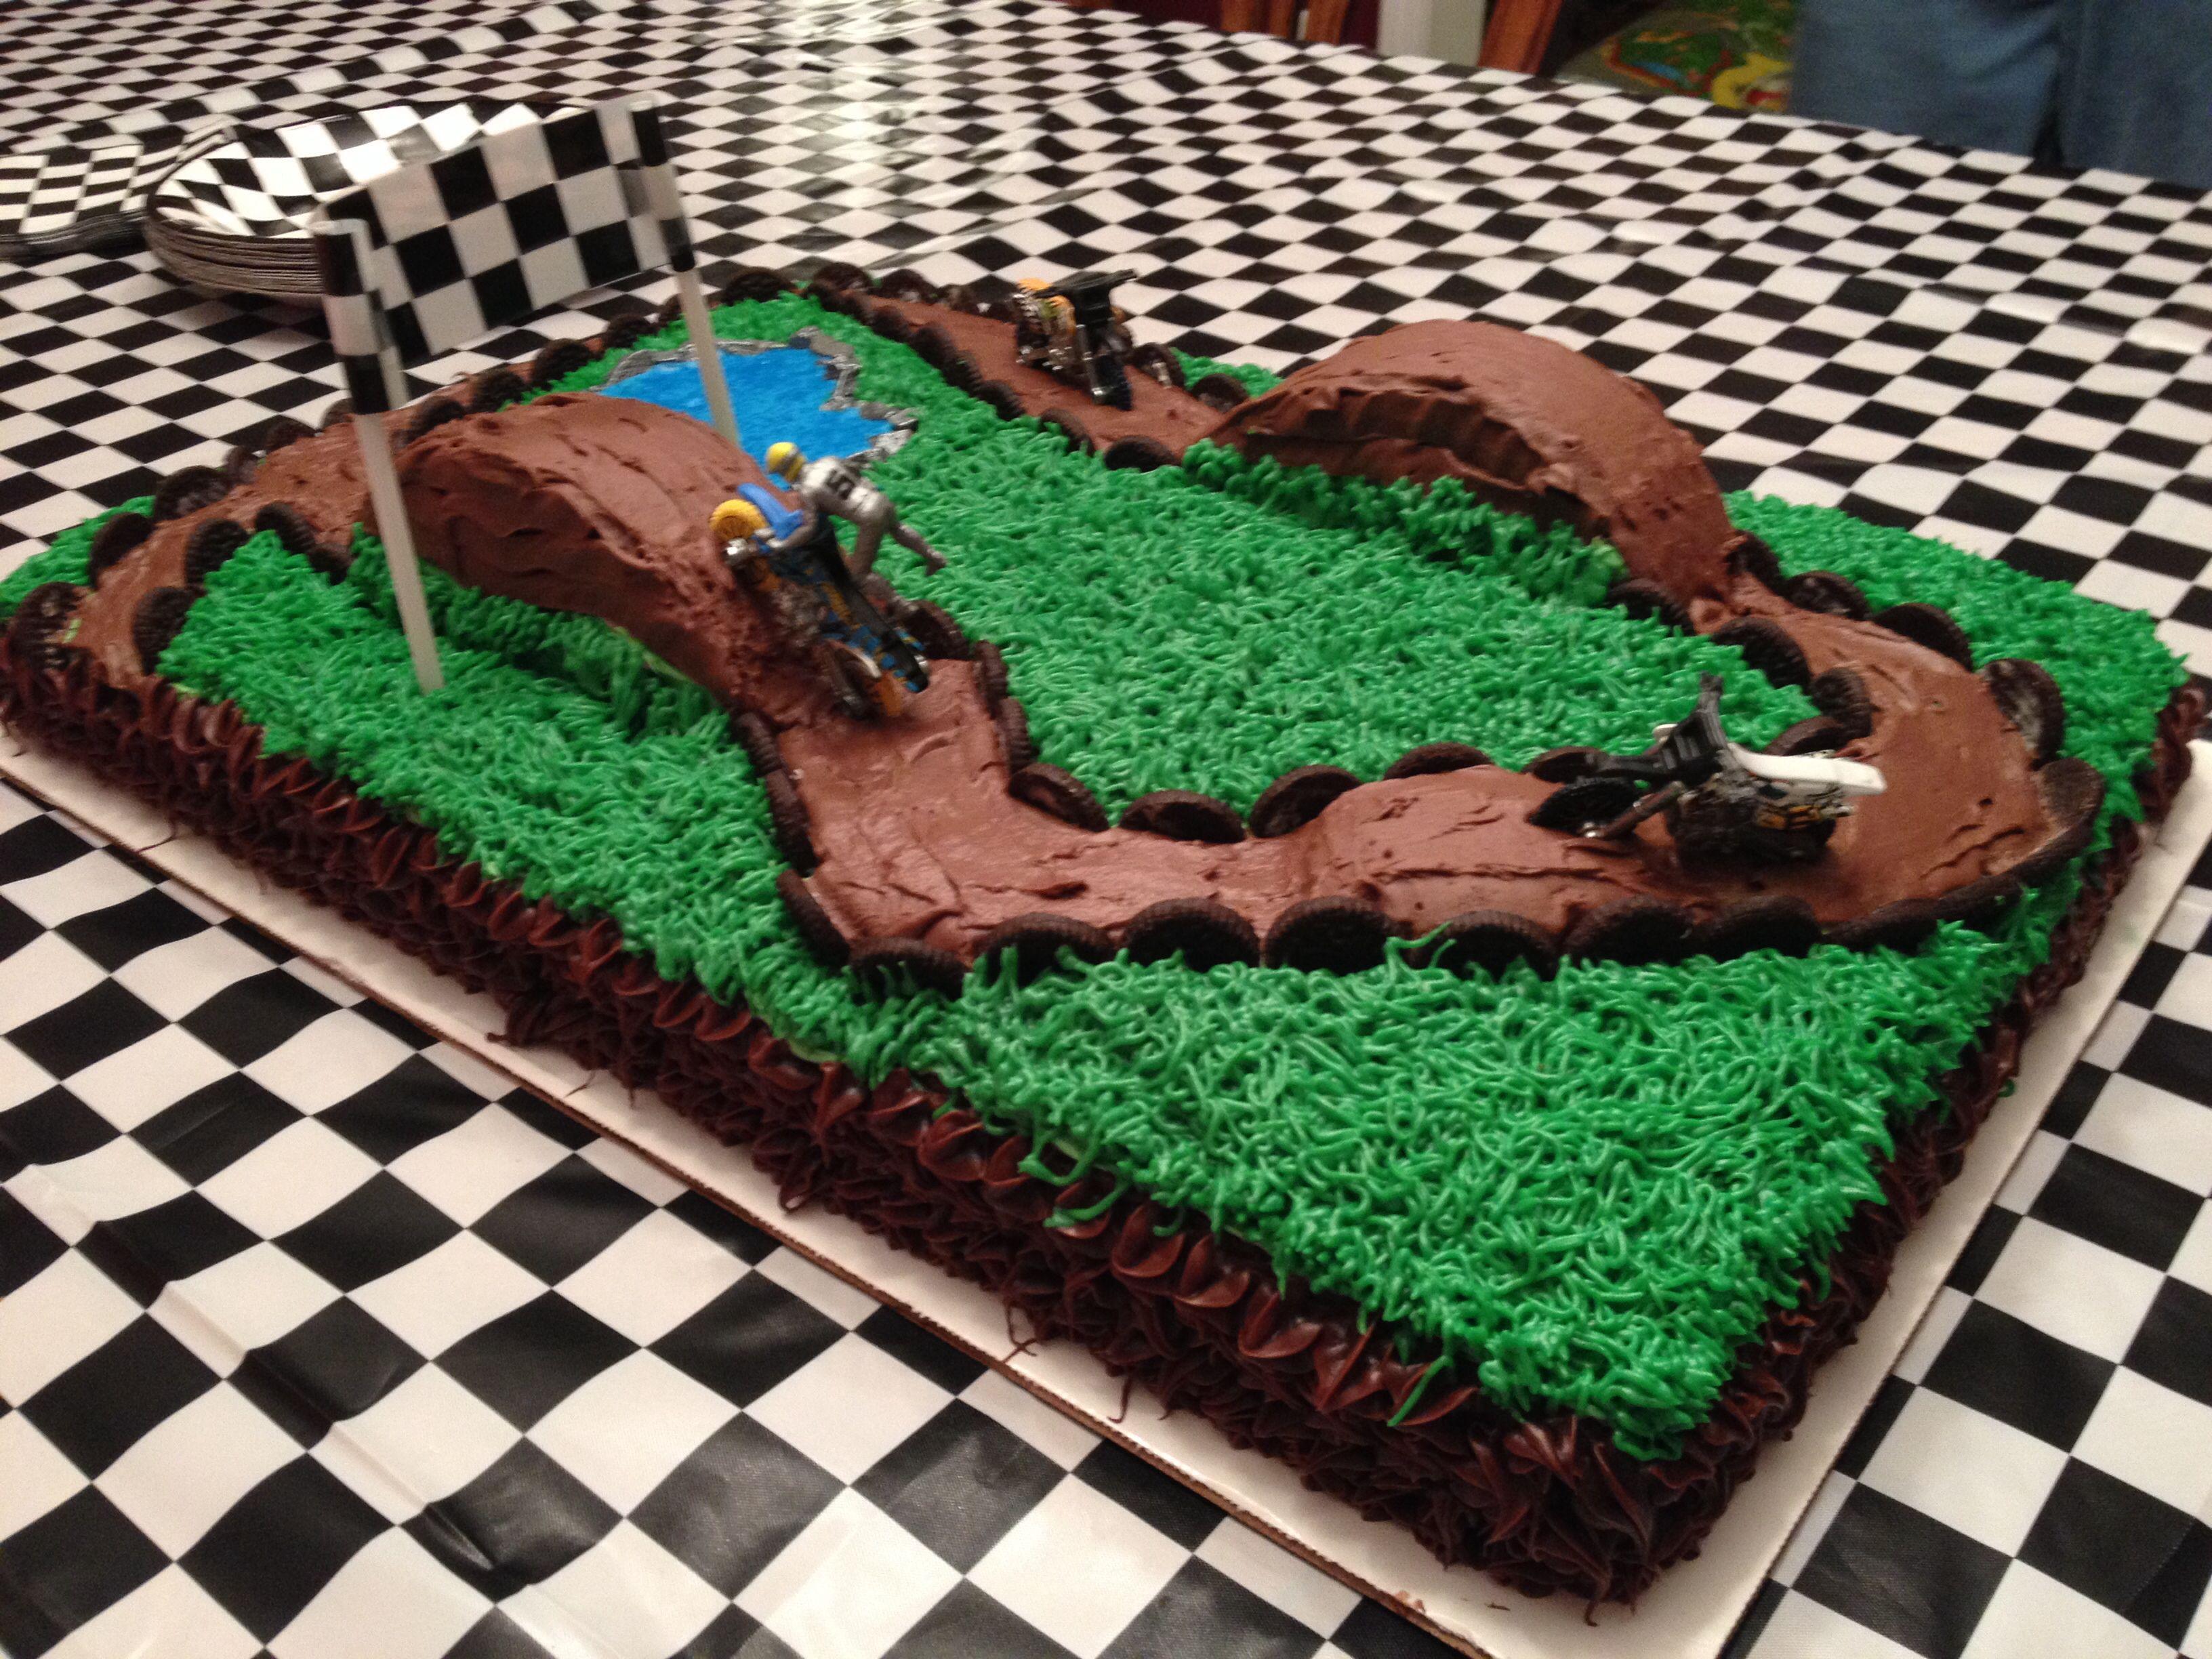 Cake Decorating Dirt Bike Track : Dirt track cake Cakes Pinterest